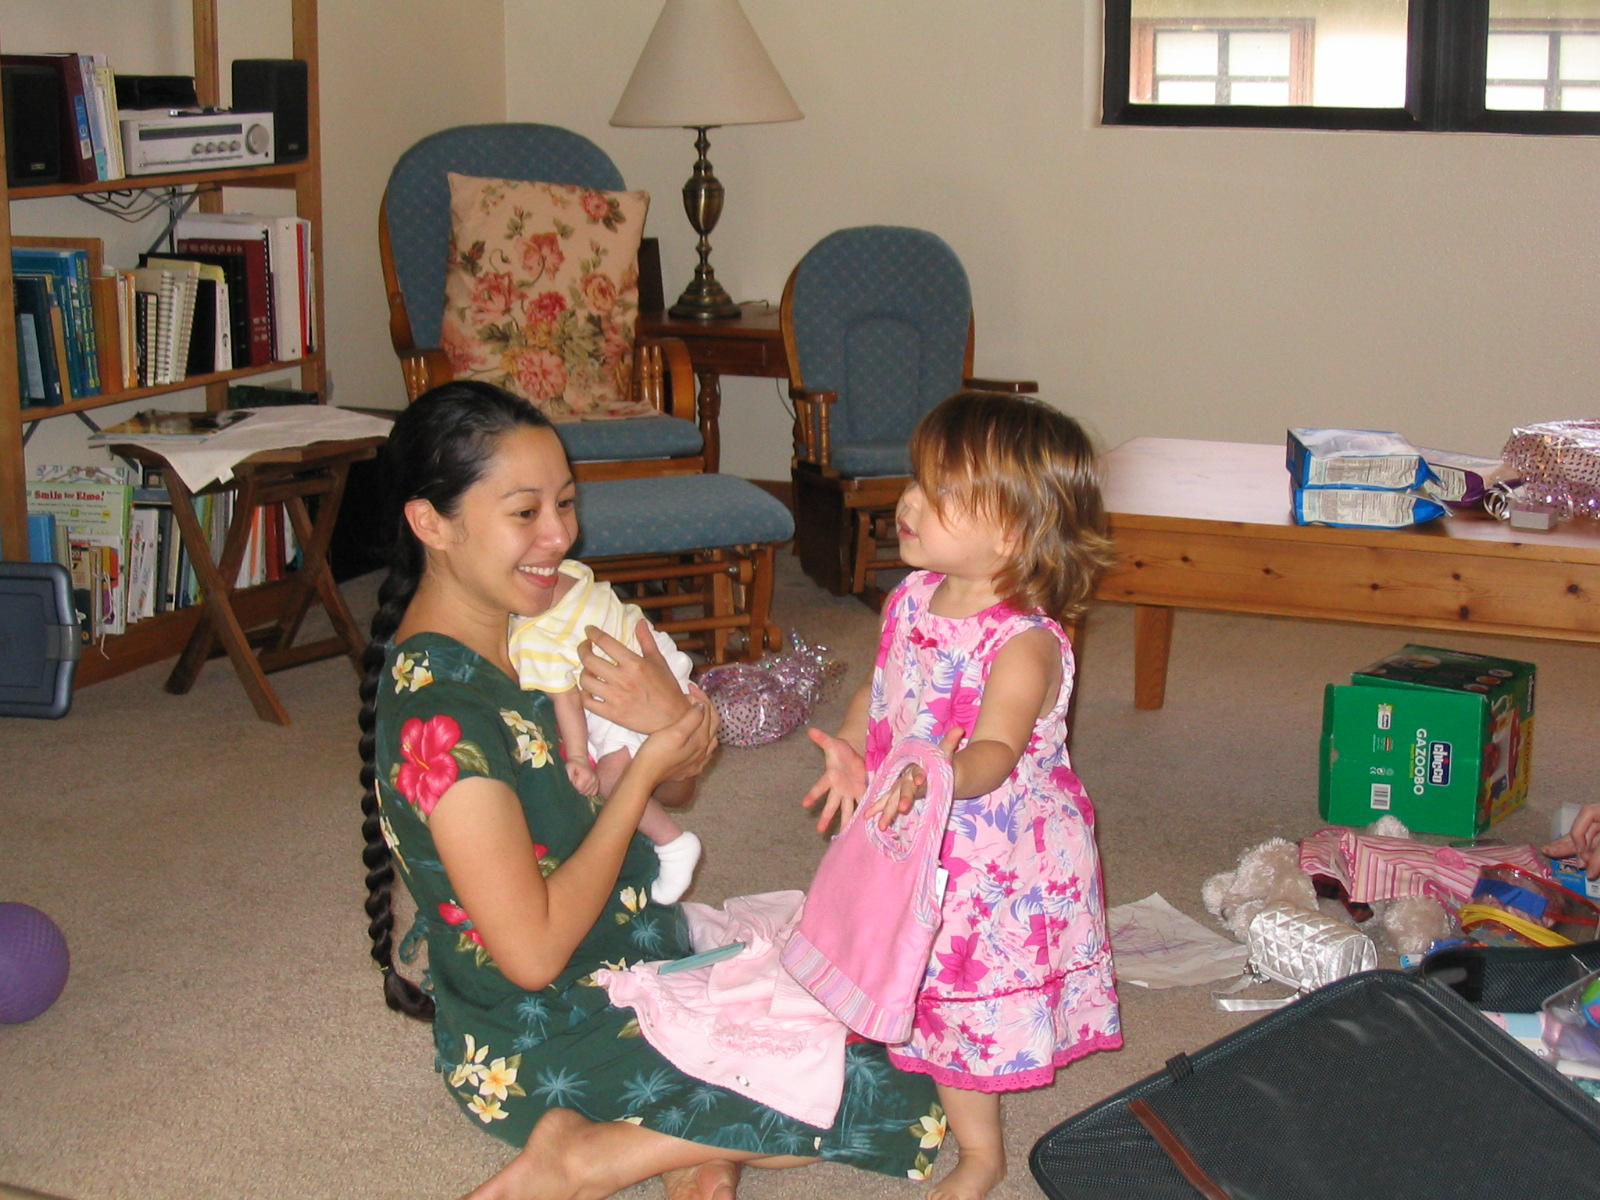 April 2005 013 - Franicia Mommy and girls newborn Pelaiah Heistheway.jpg